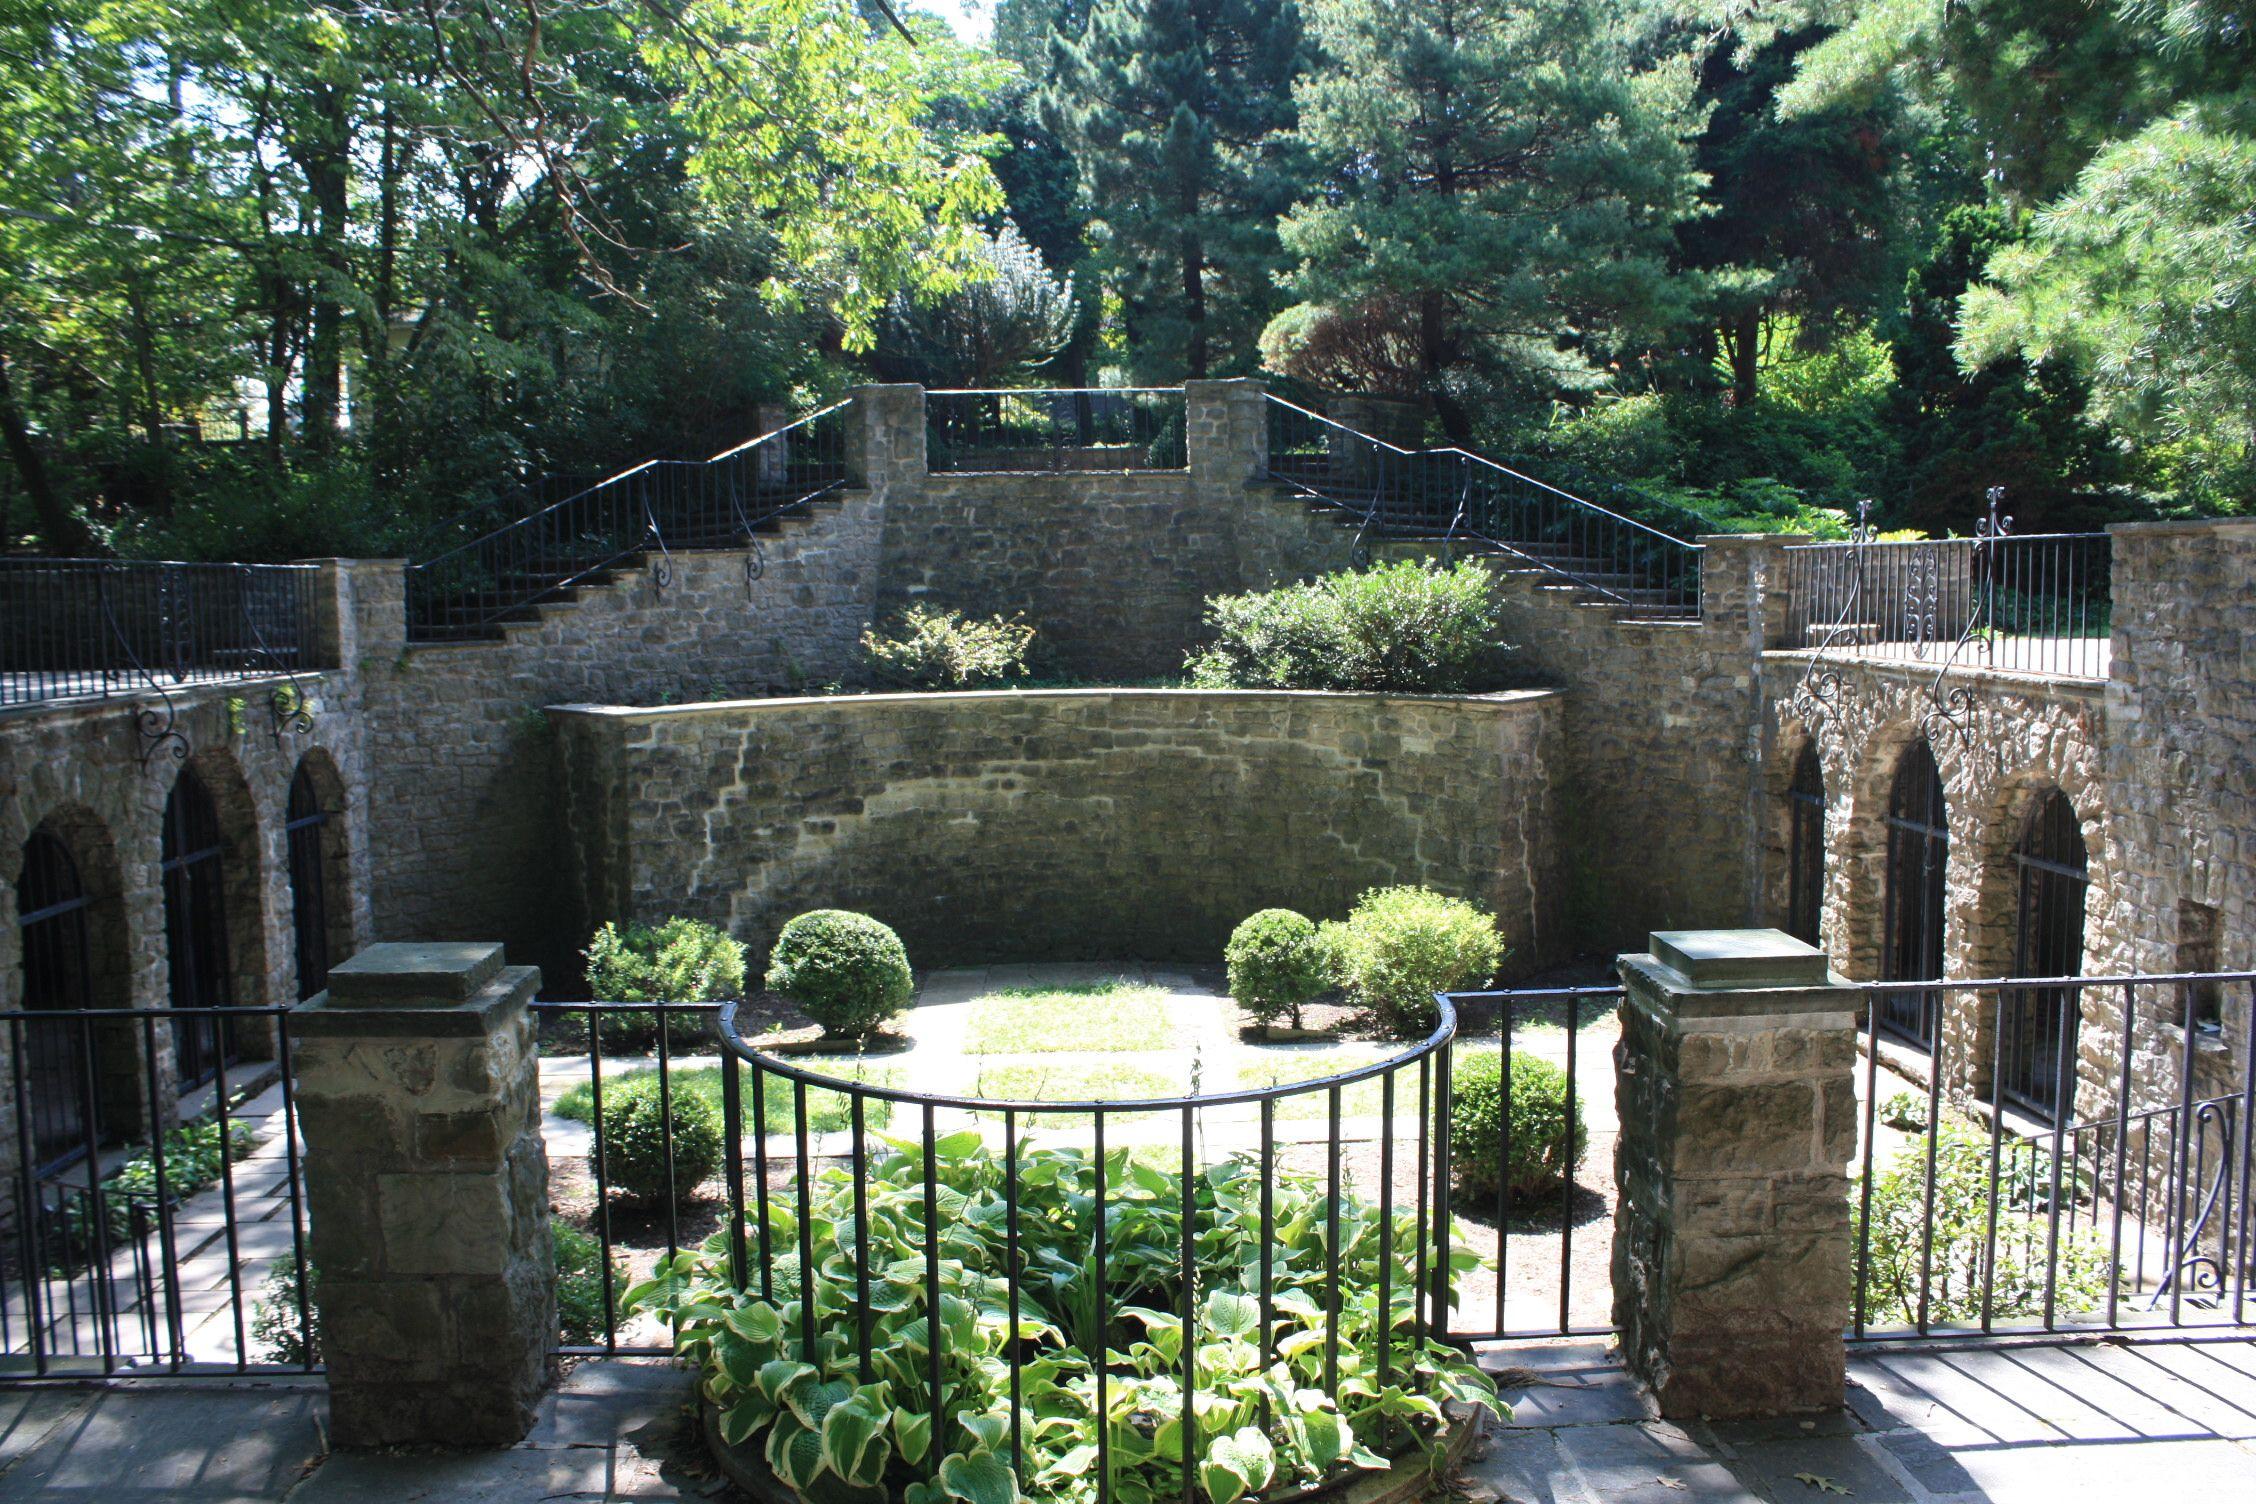 Garden Sheds Rochester Ny sunken gardens, highland park, rochester, ny saradotyphotography